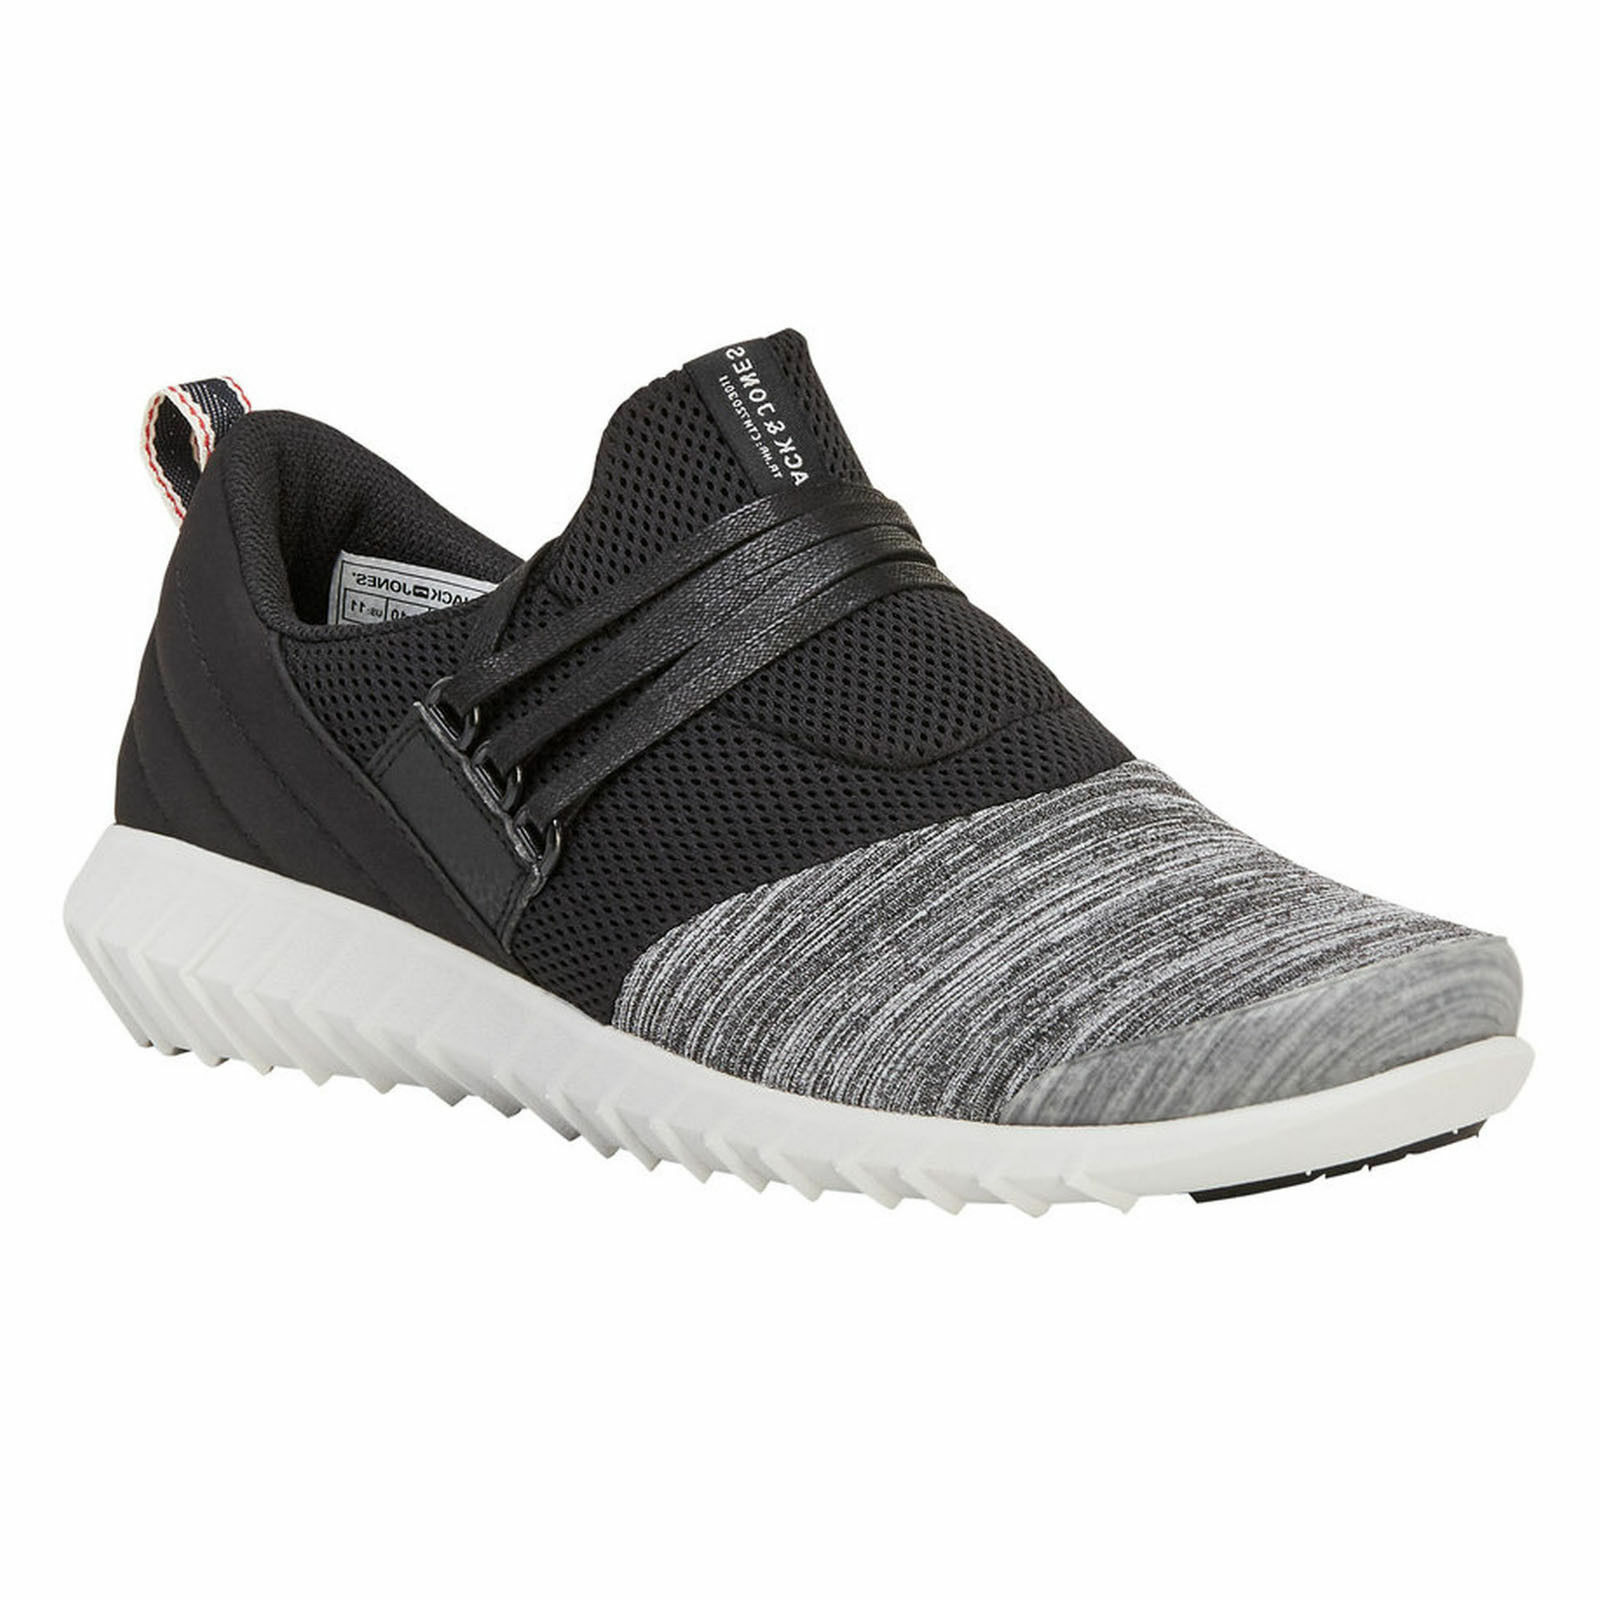 Jack & Jones Originals Trainers Mens Fashion Trend Knit Sneakers Shoes JFWDragon